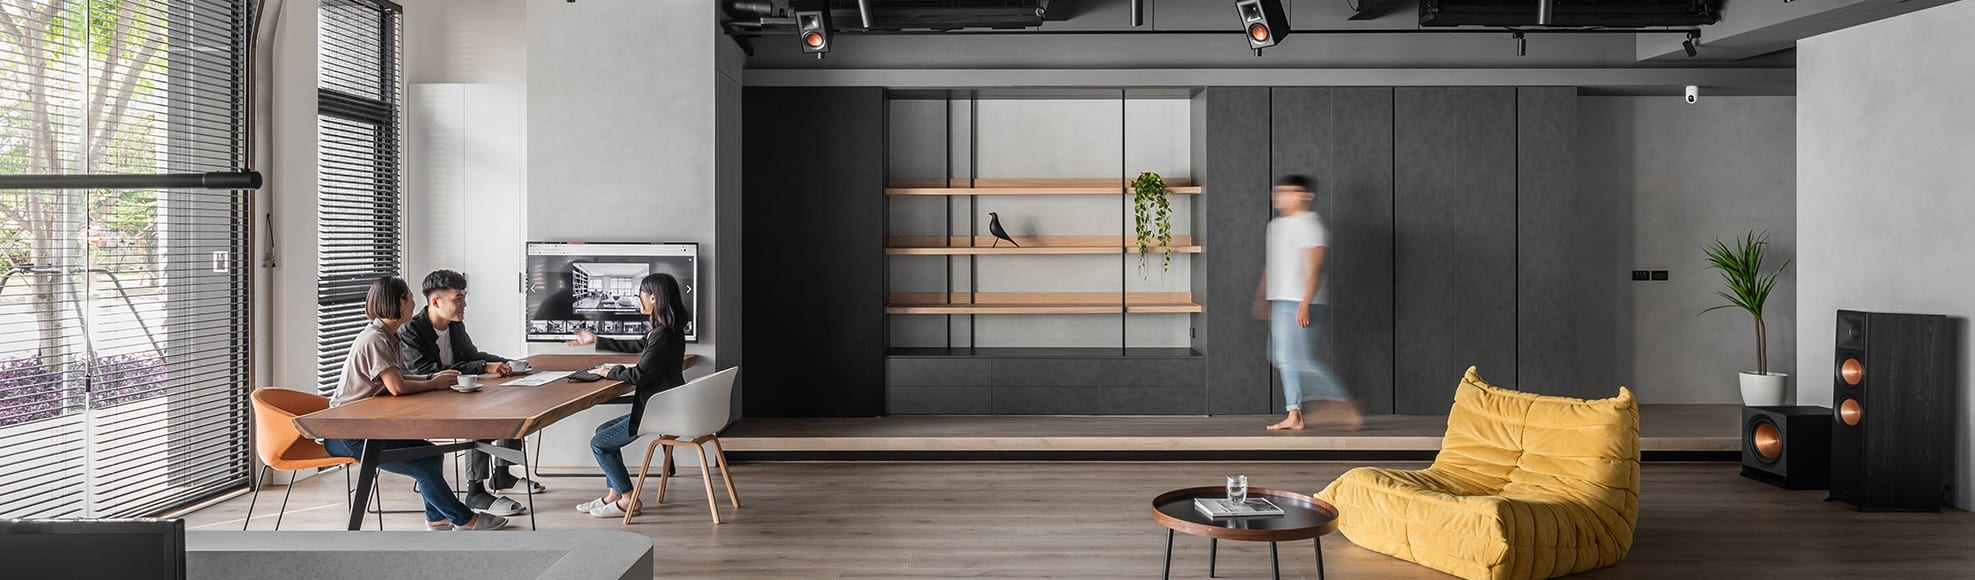 極簡室內設計 Simple Design Studio